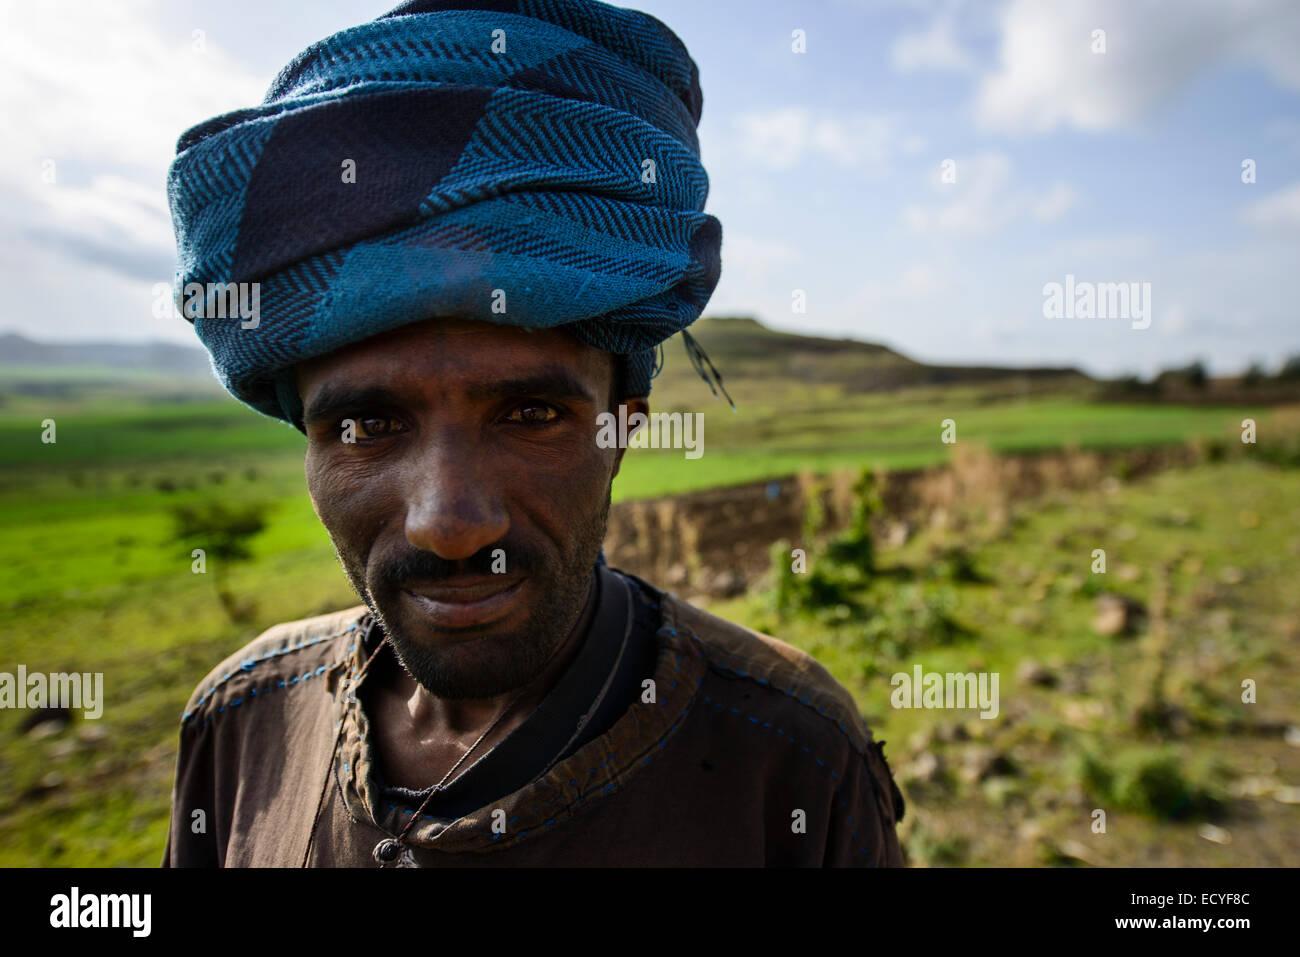 Ethiopian farmer, Northern Ethiopia - Stock Image